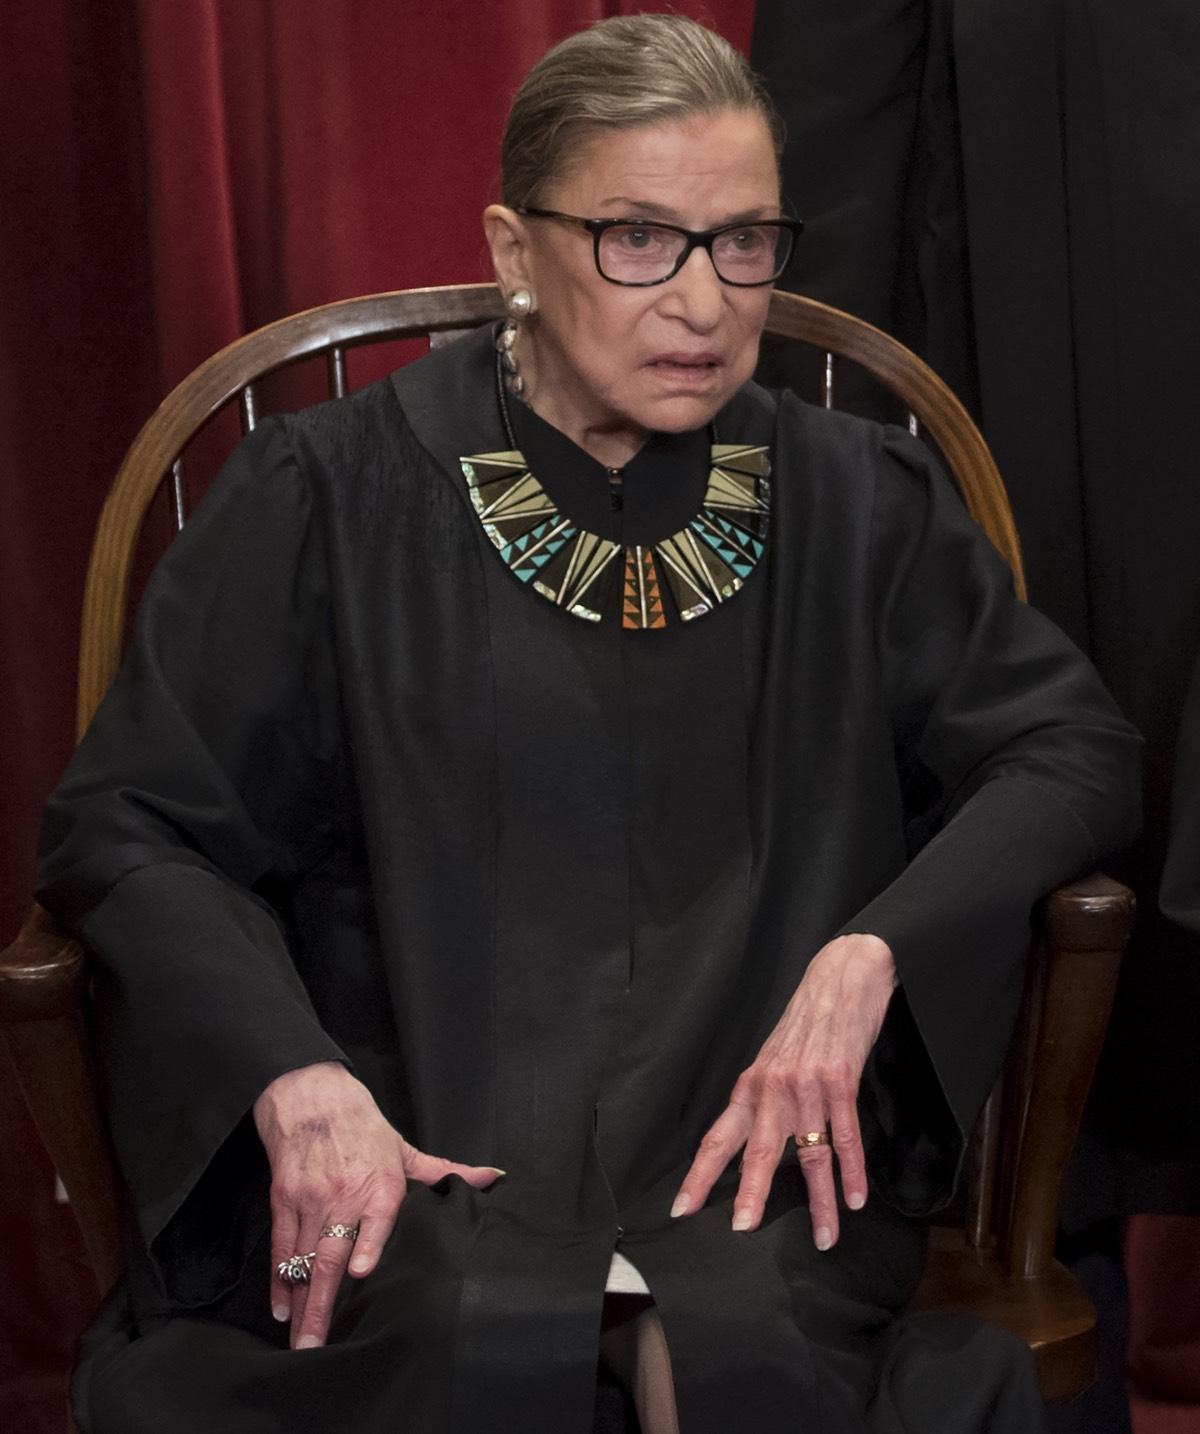 US Supreme Court Justice Ruth Bader Ginsburg